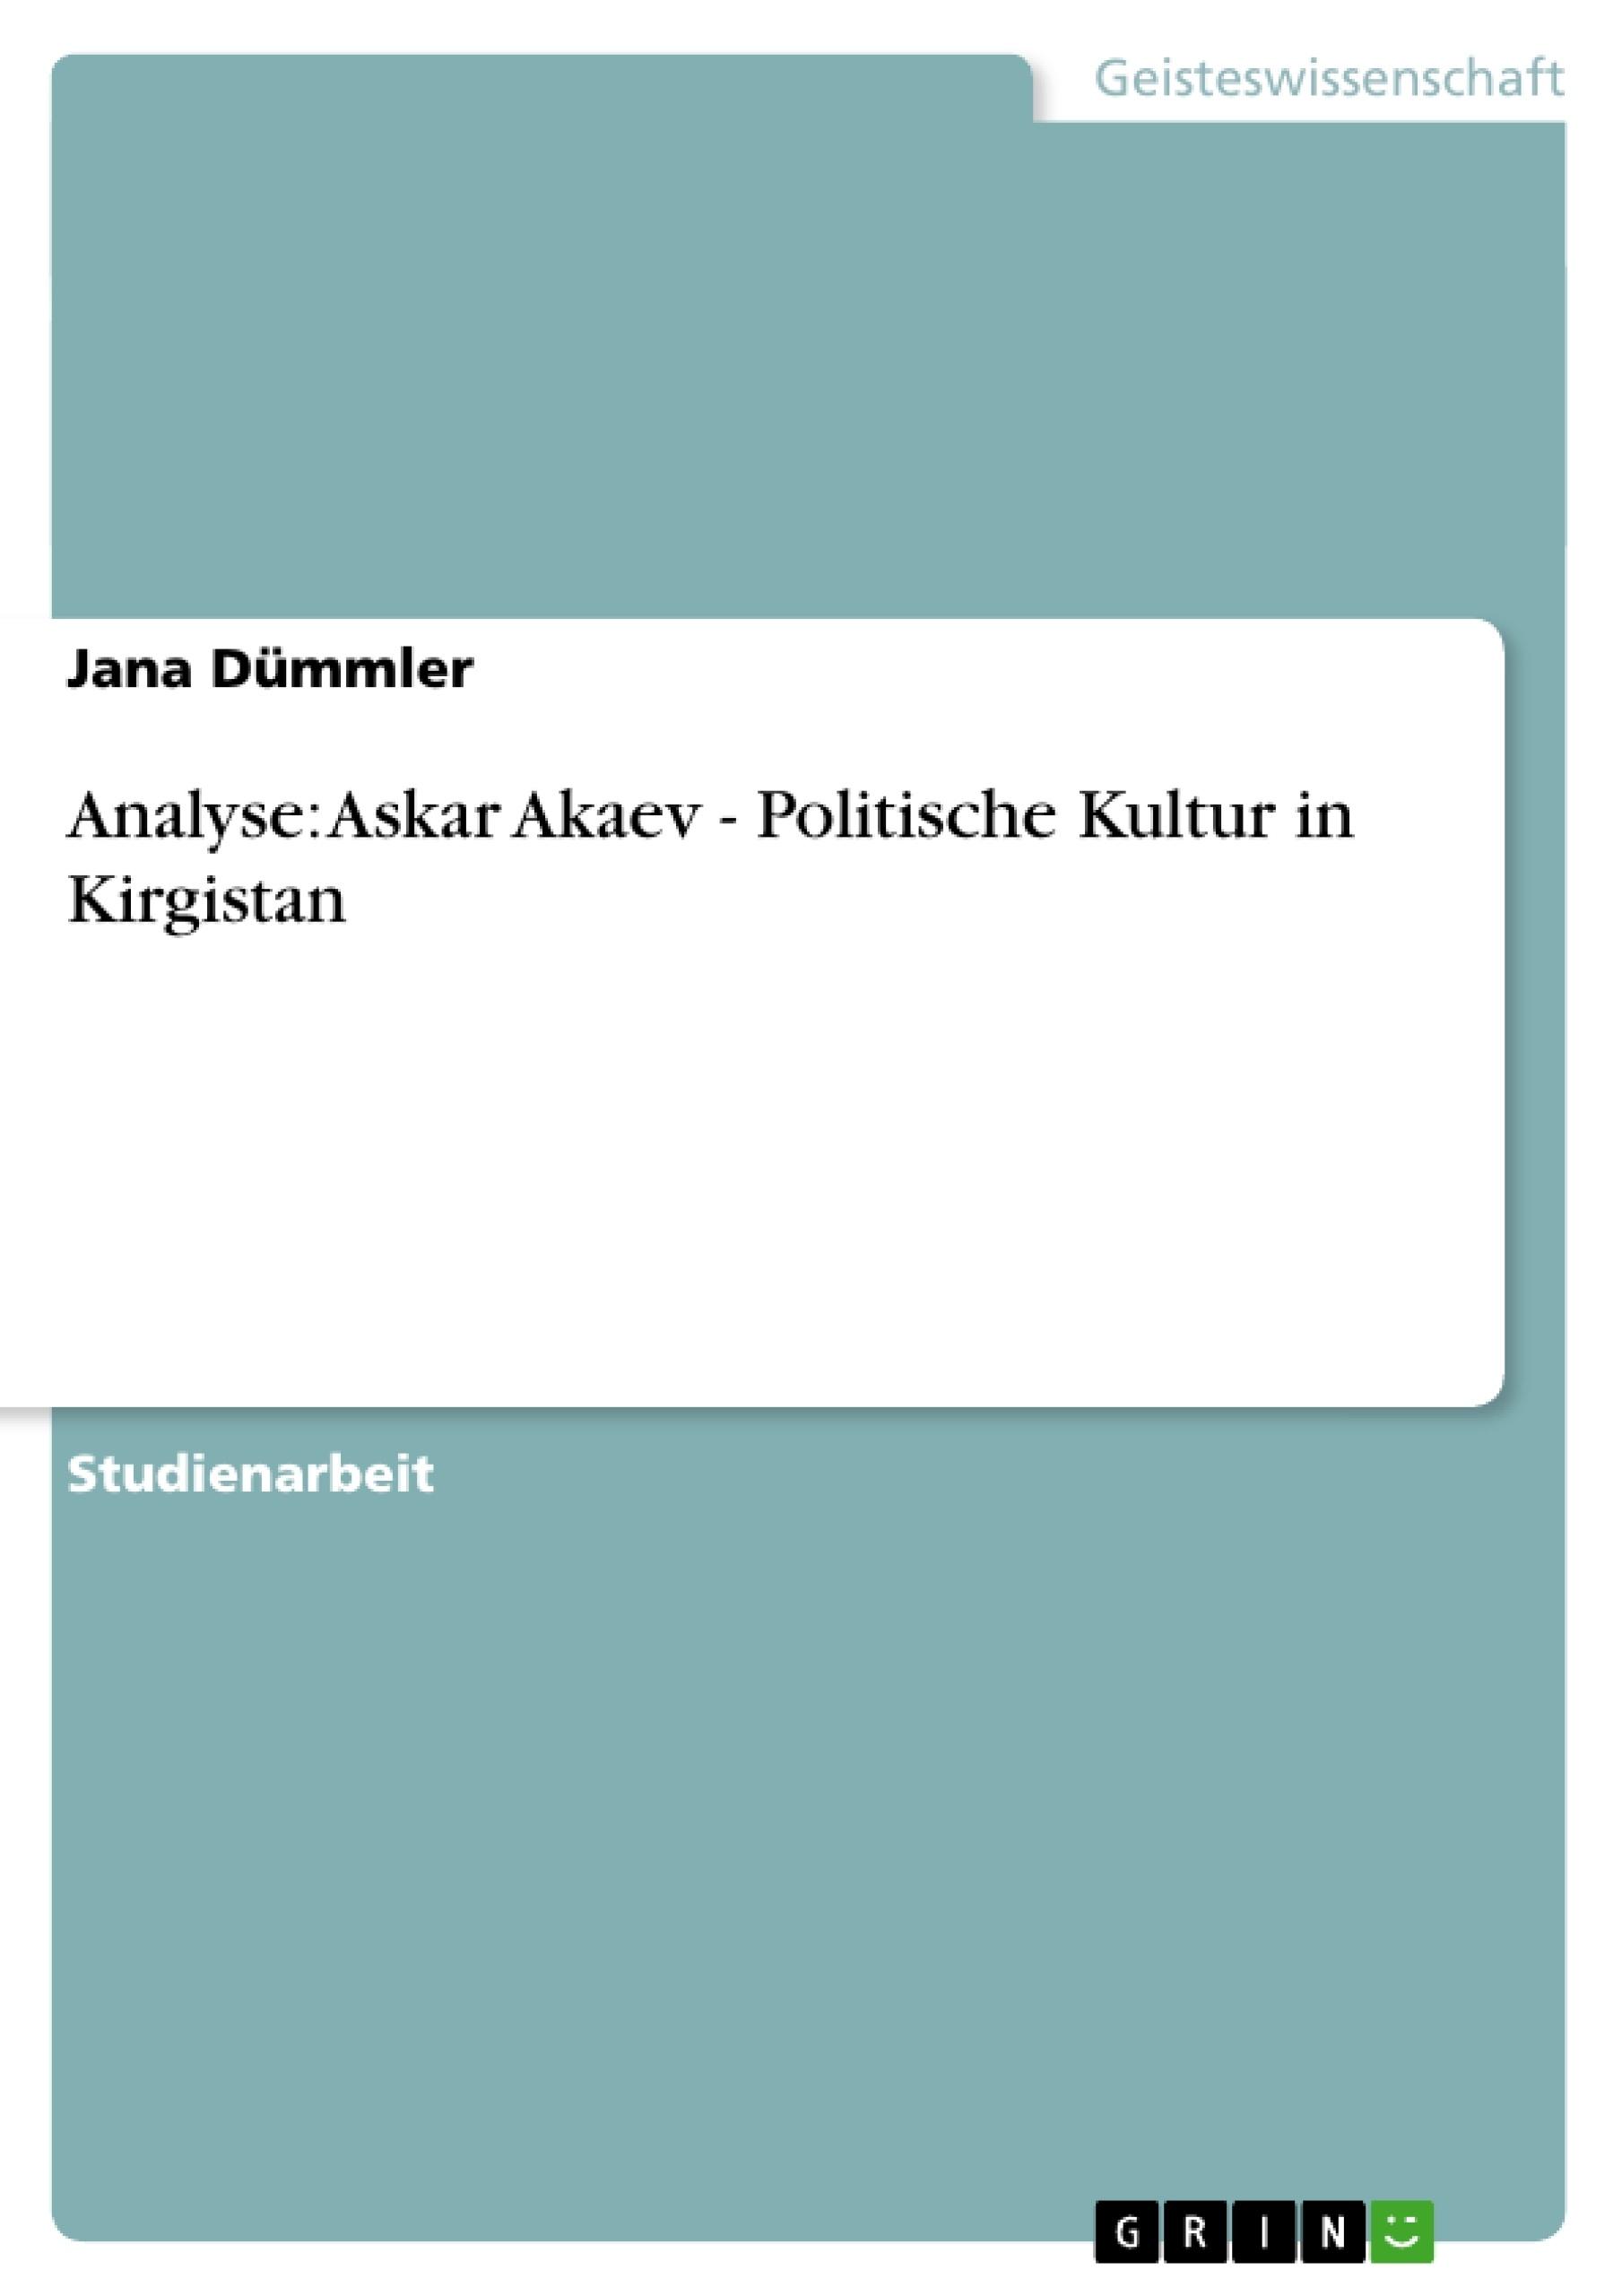 Titel: Analyse:  Askar Akaev -  Politische Kultur in Kirgistan